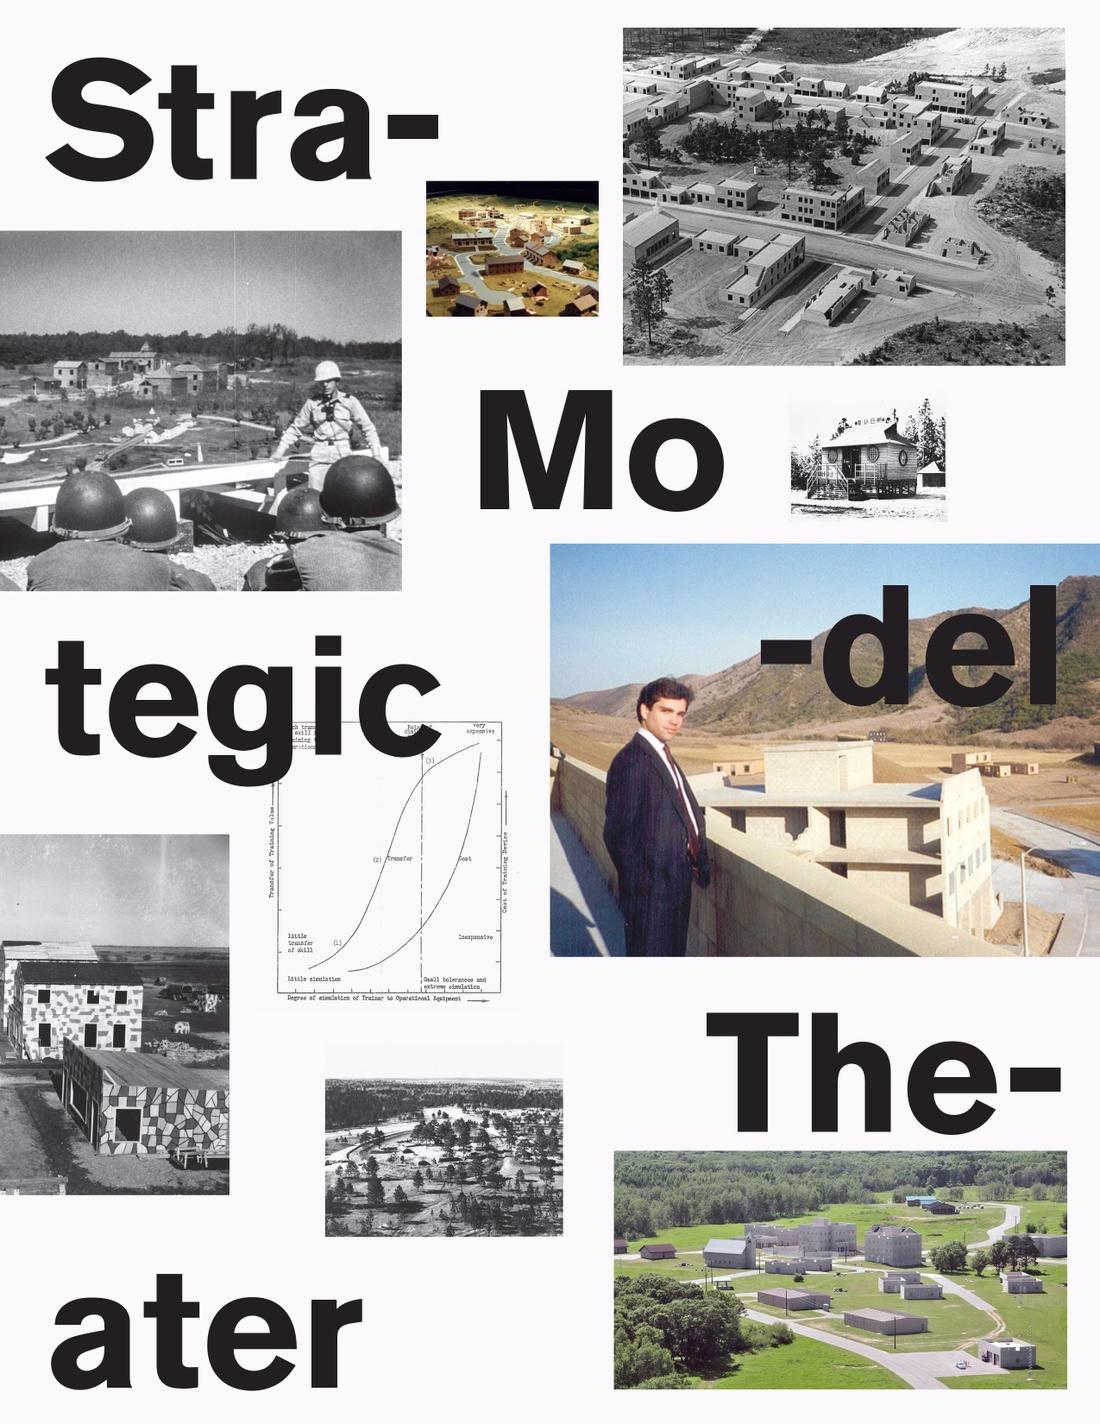 Strategic model theater collage.